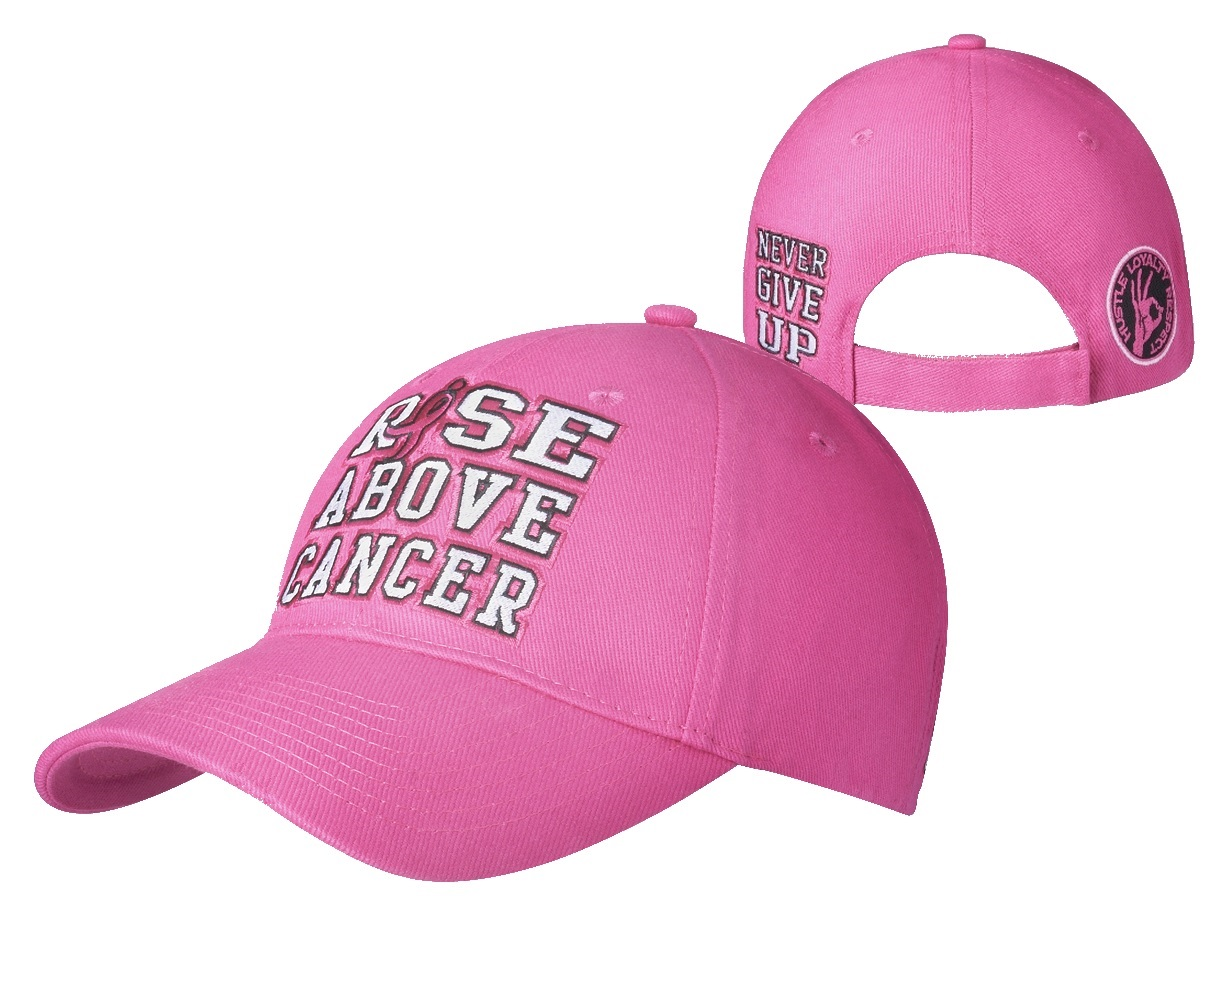 John Cena Quot Rise Above Cancer Quot Baseball Hat Pro Wrestling